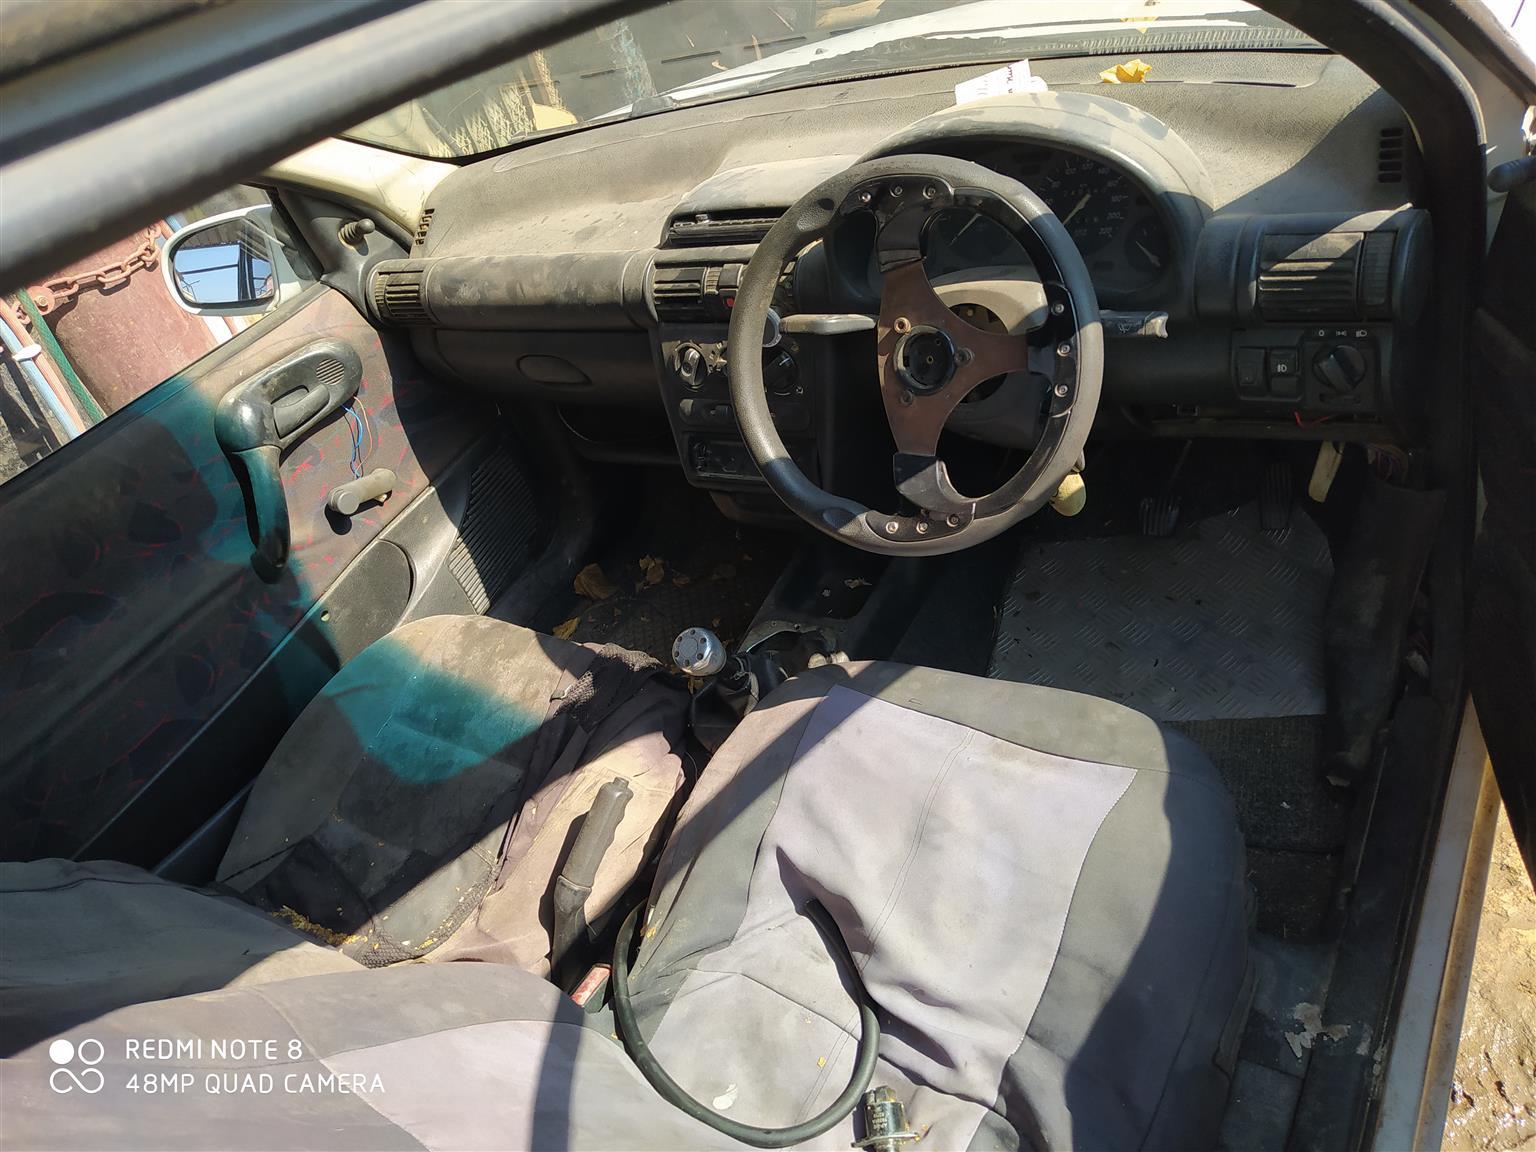 1996 Opel Corsa Utility